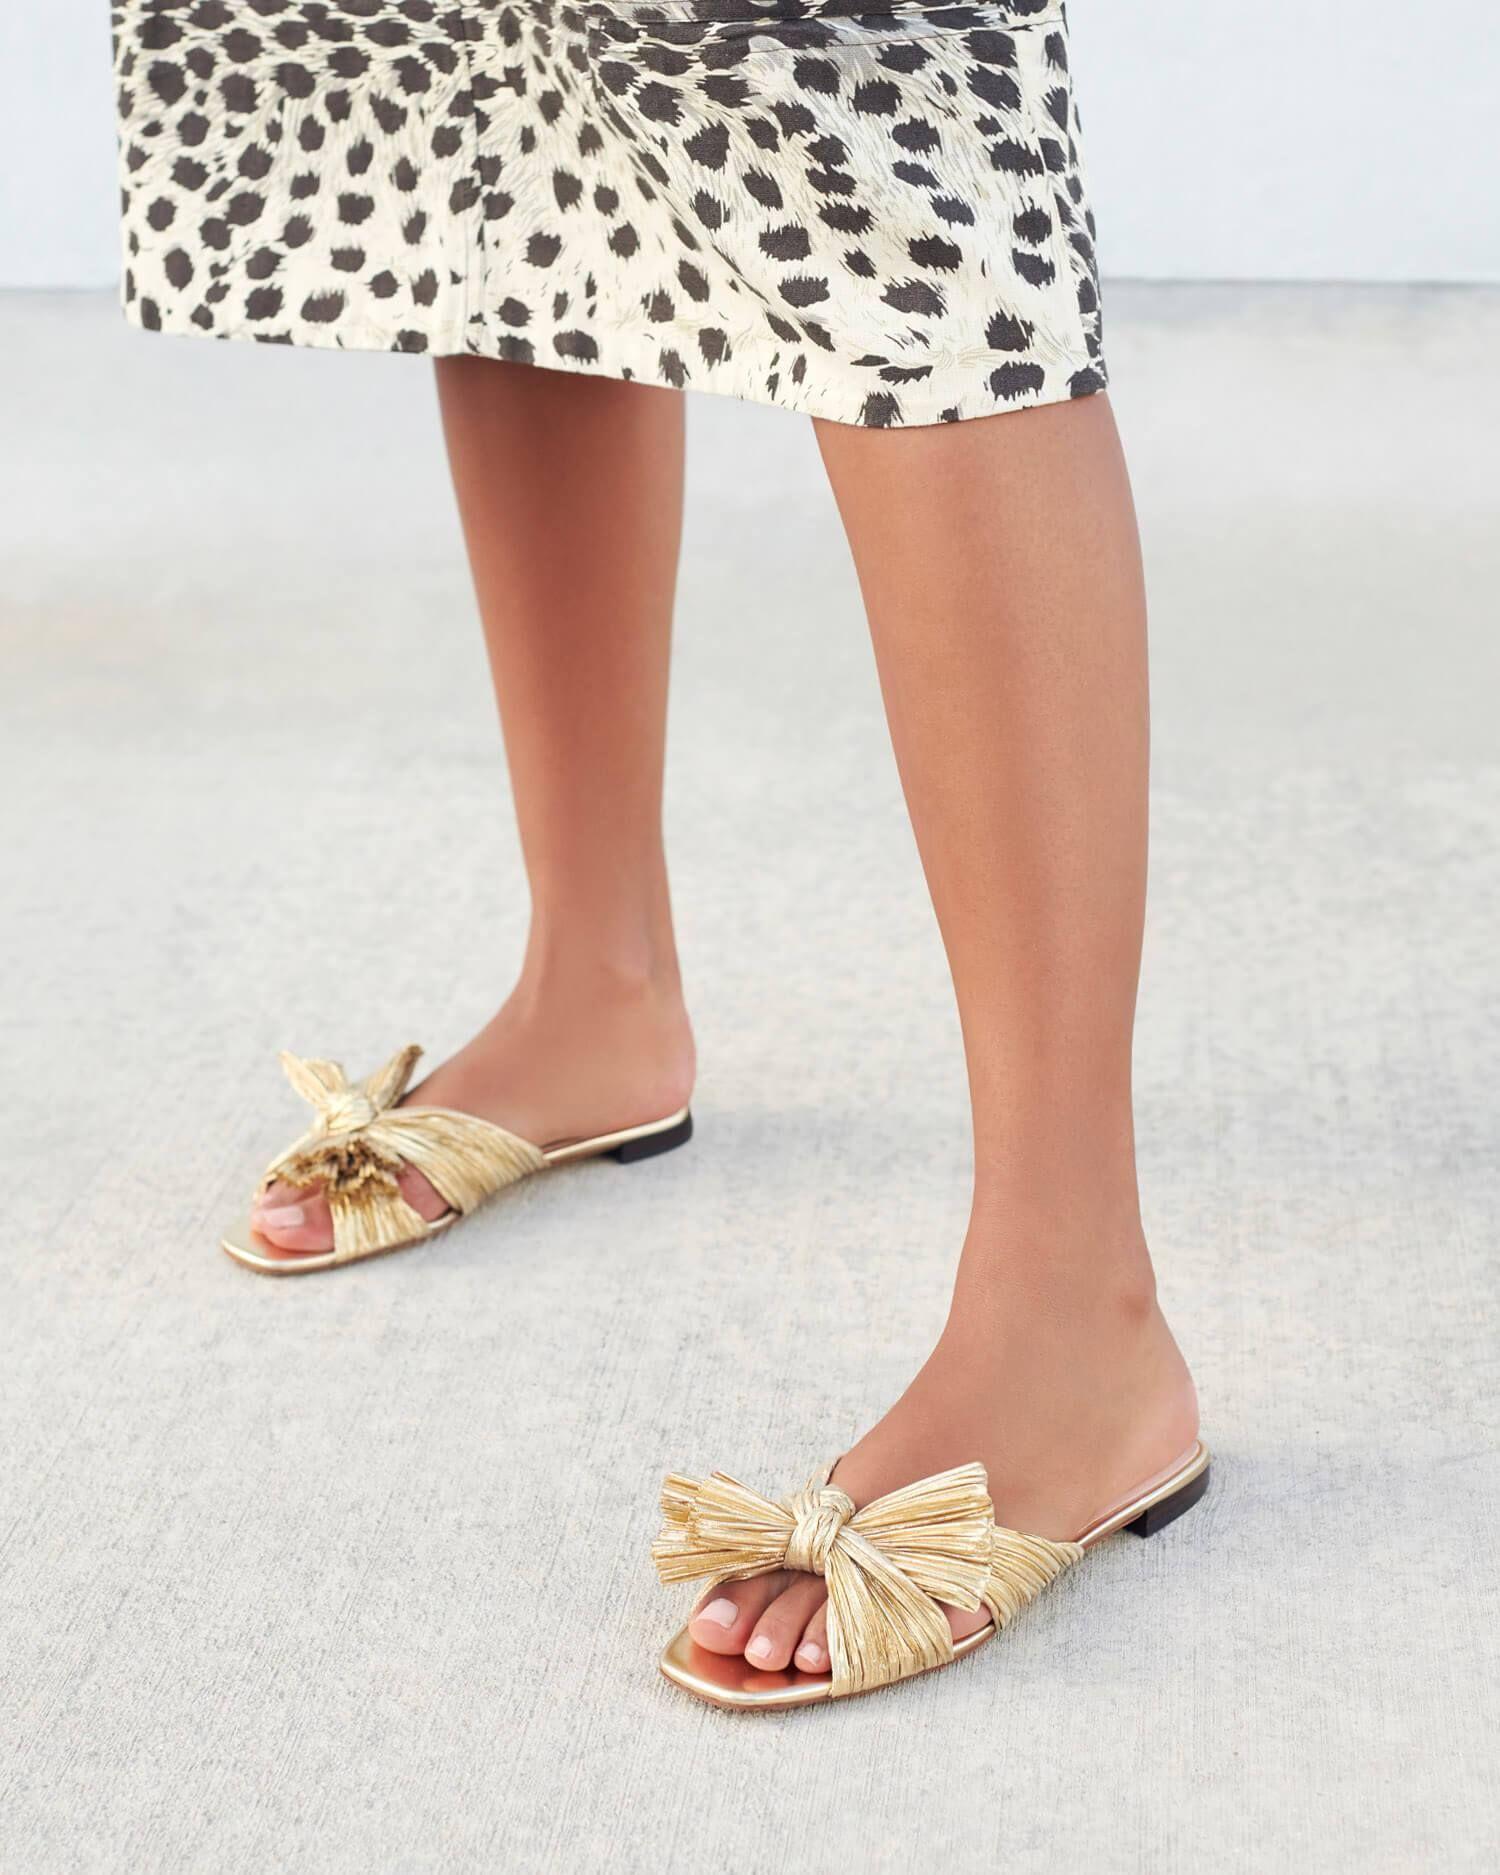 Daphne Knot Flat Sandal Gold In 2020 Flat Sandals Daphne Low Heel Sandals